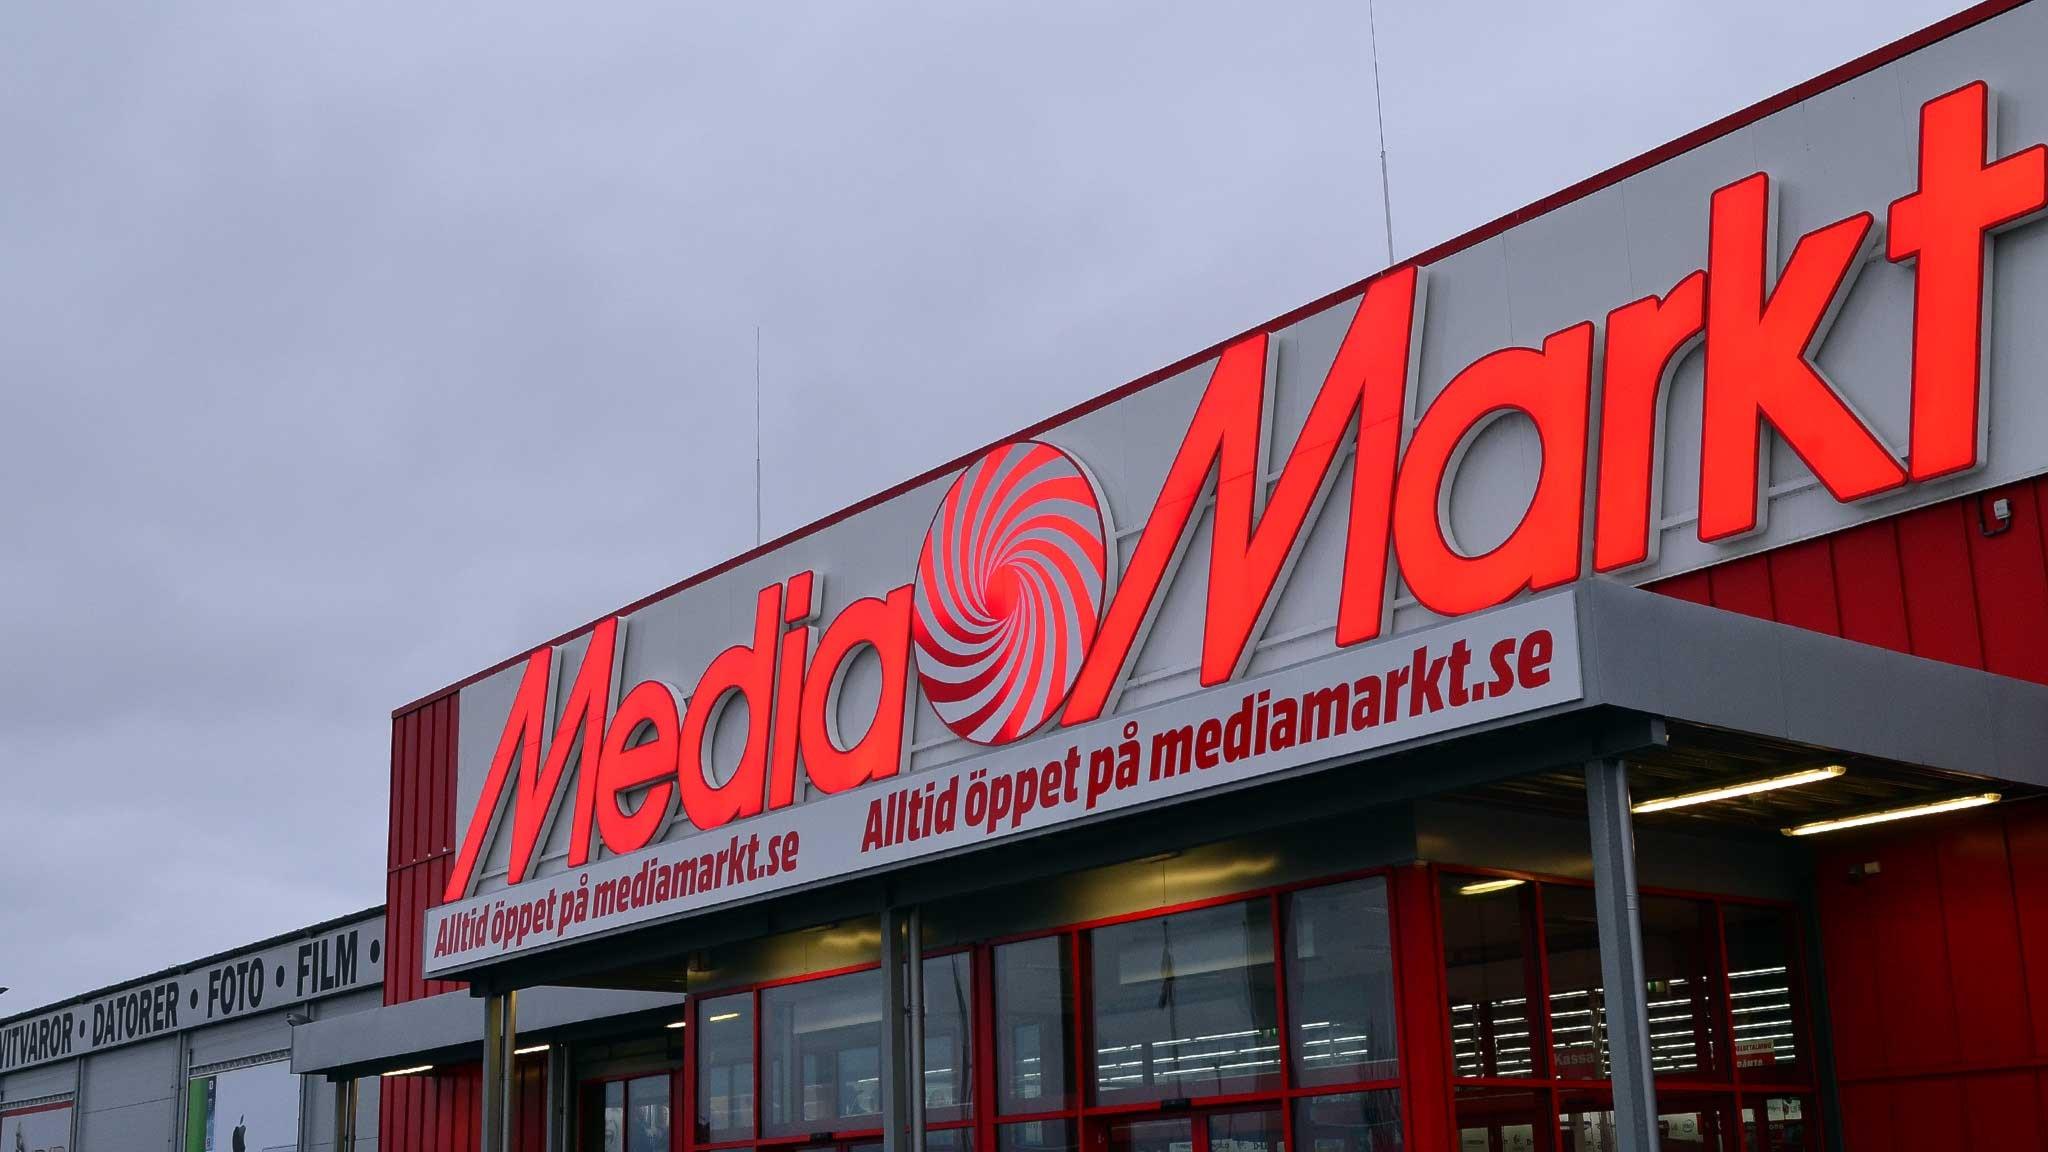 Media markt eskilstuna öppet